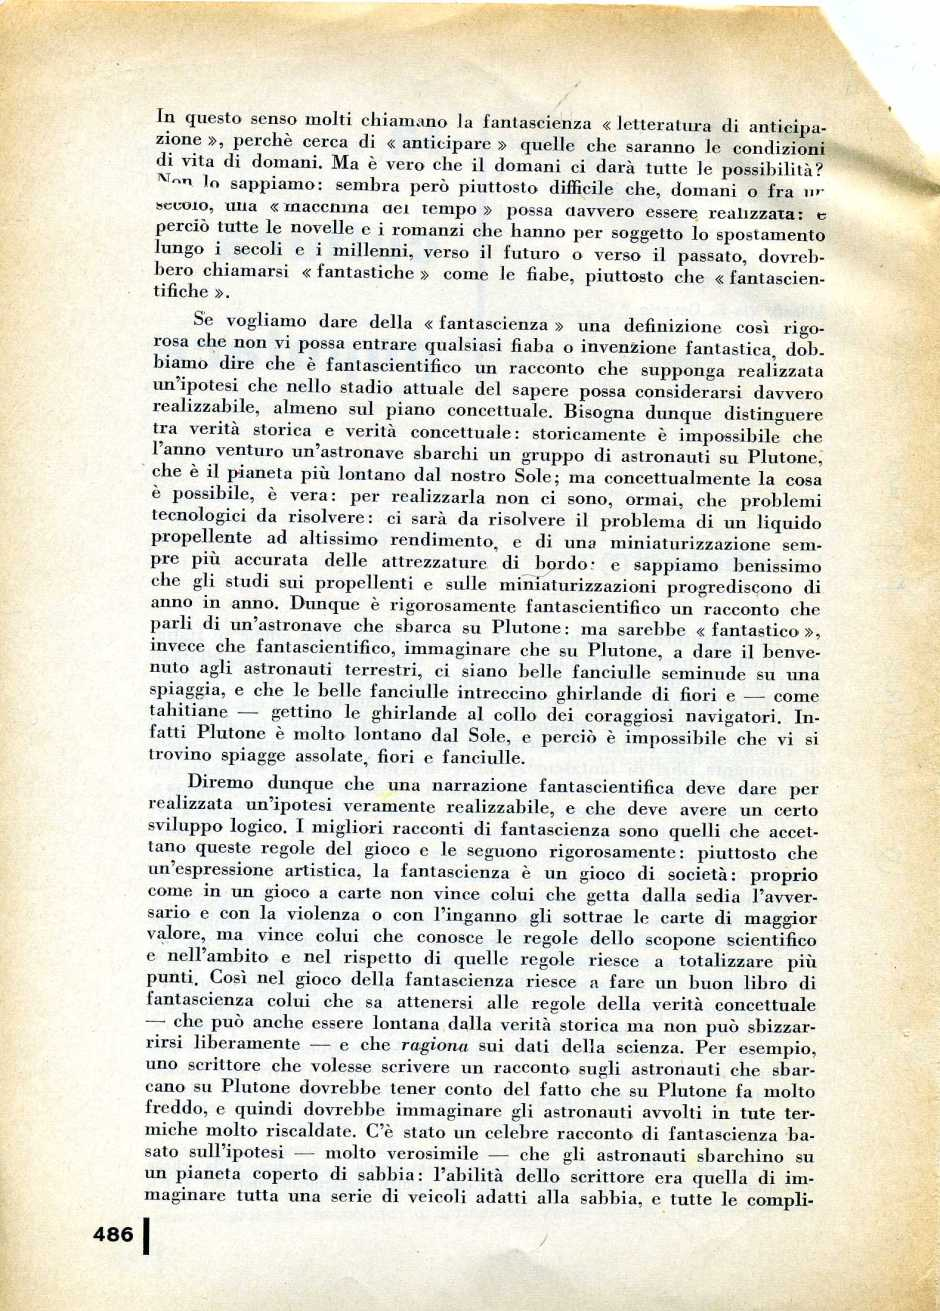 L  CONTI FANTASCIENZA1970